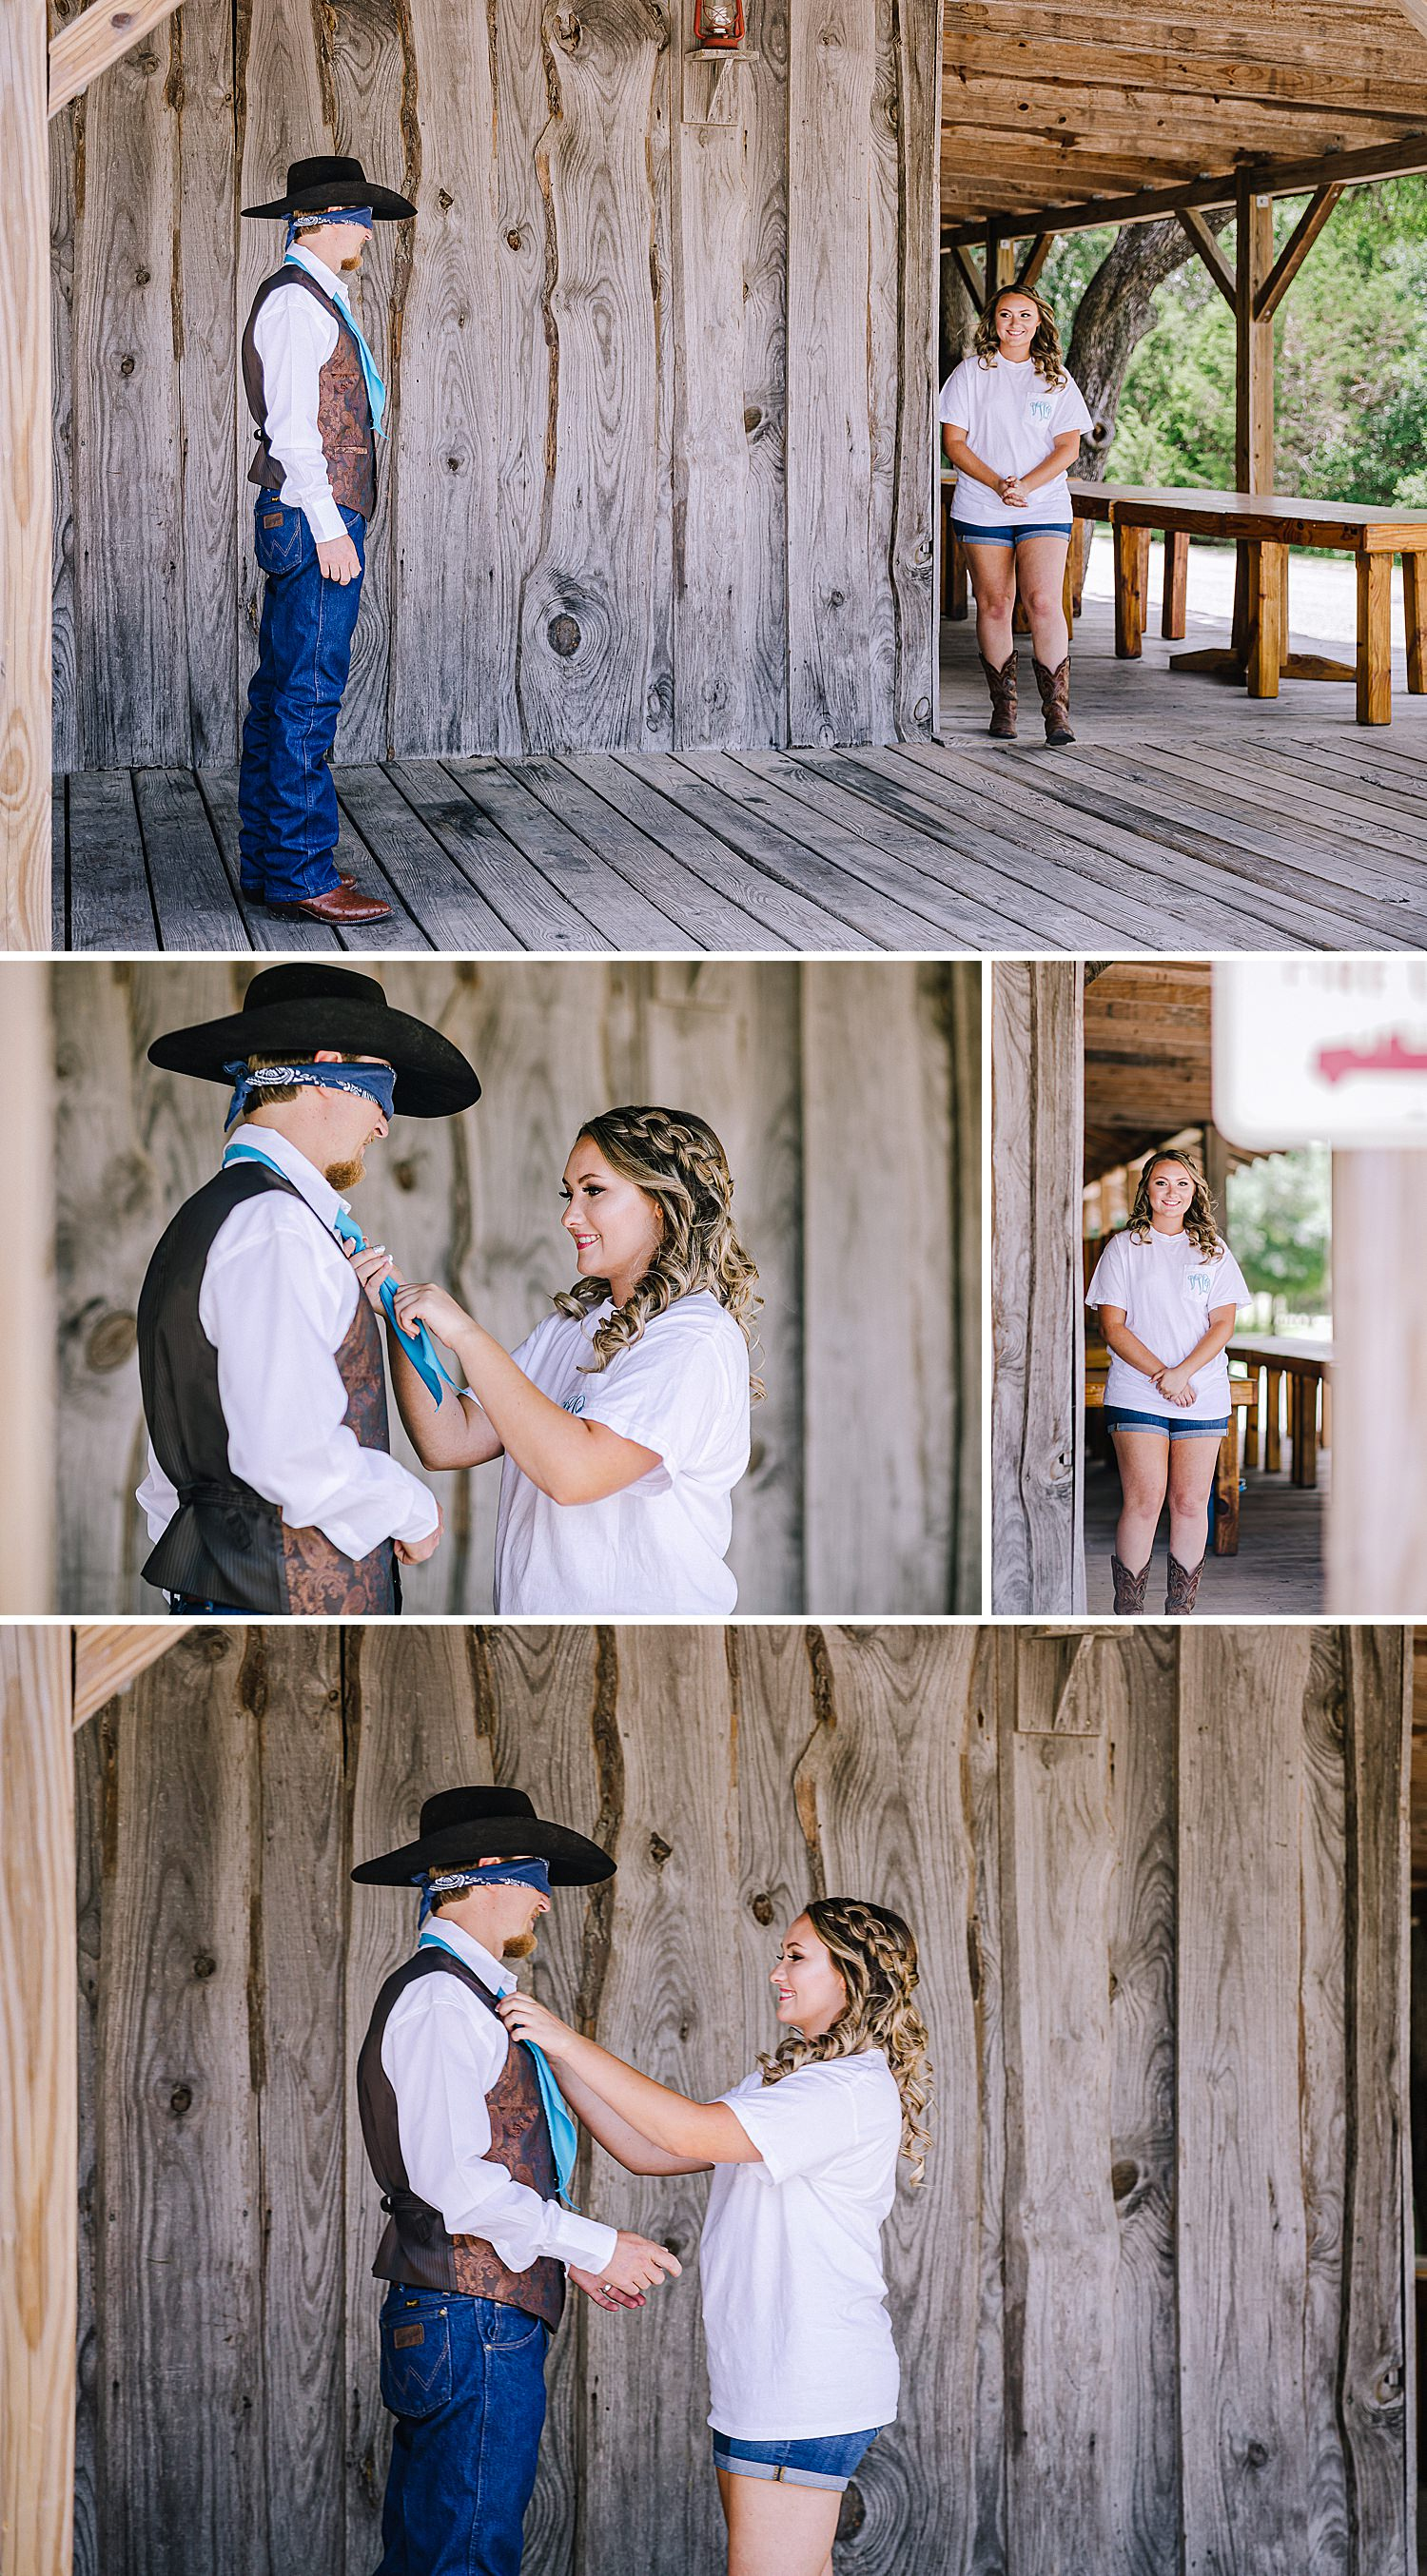 Carly-Barton-Photography-Old-Town-Texas-Rustic-Wedding-Photos-Sunflowers-Boots-Kyle-Texas_0026.jpg